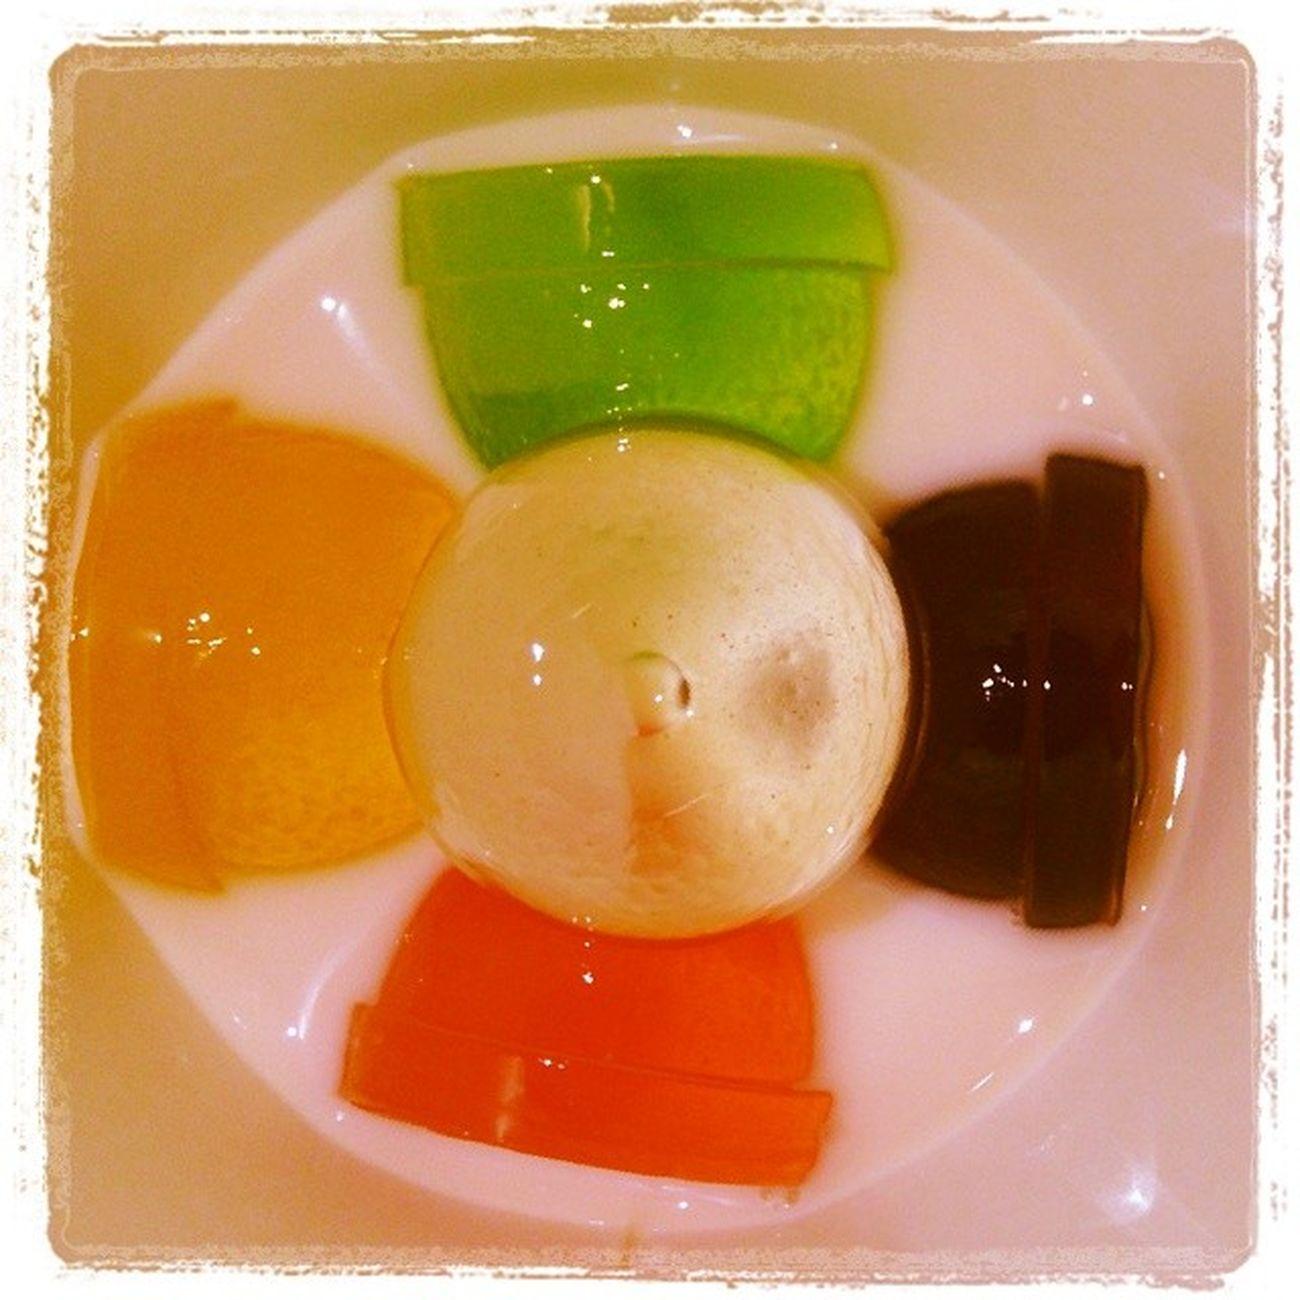 Rainbow Jellies Natadecoco Mixberry yoghurt @sevintia0520 @dhora1812 @fspamela @fukkipyon ;))